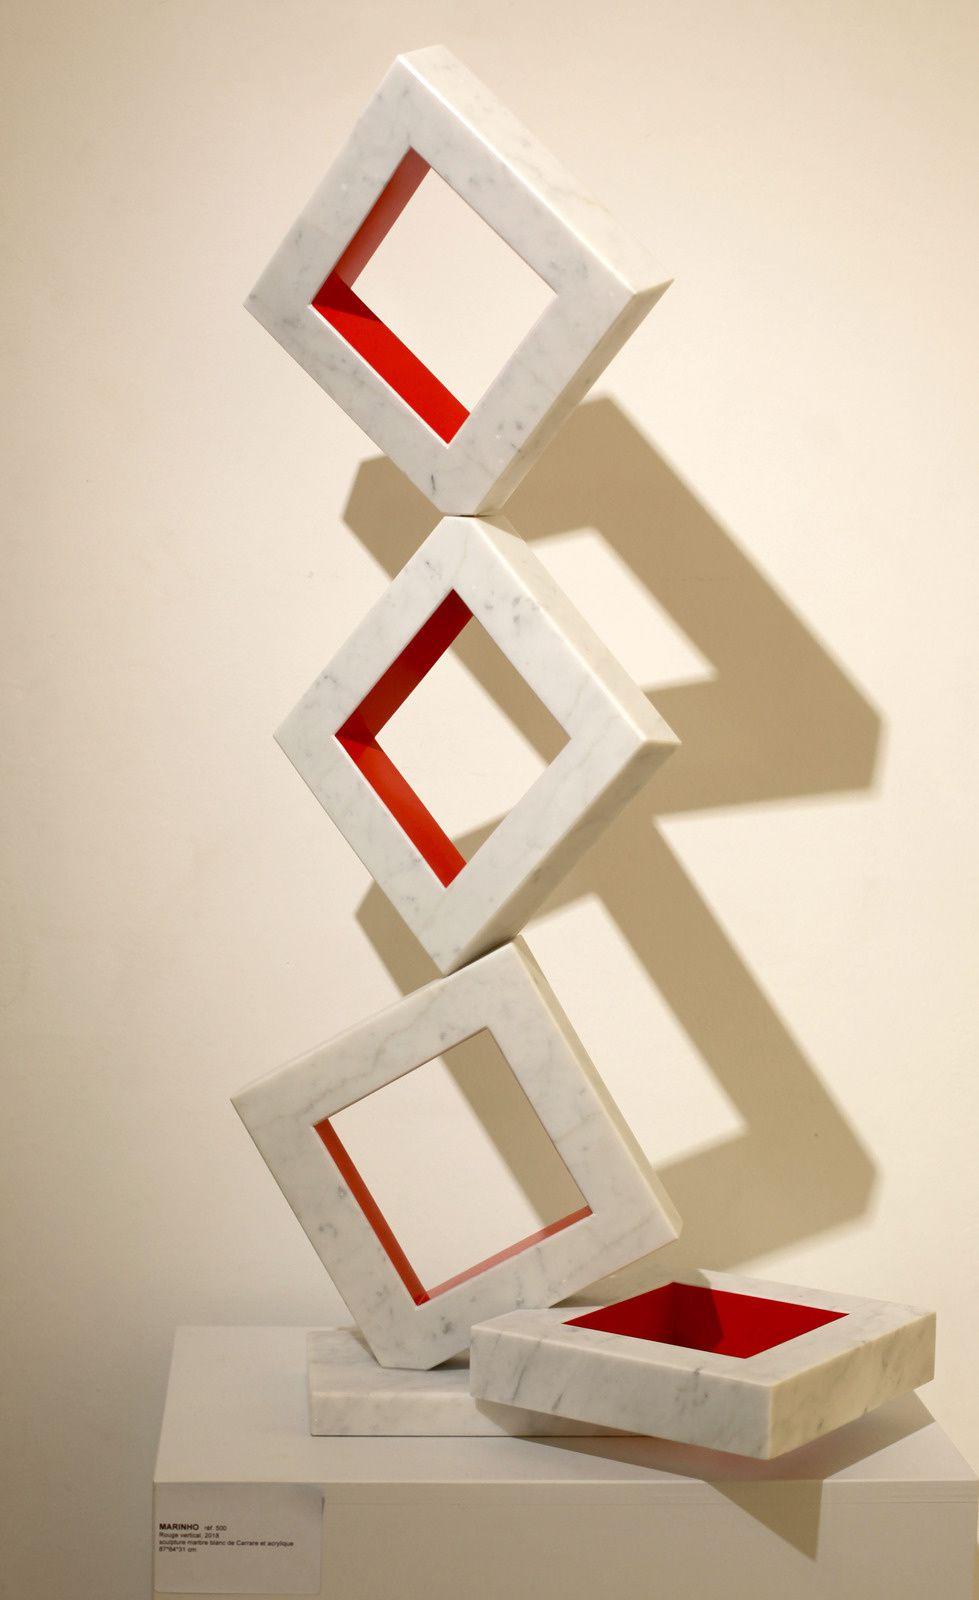 """Rouge Vertical"", 2018 de Jaildo MARINHO - Courtesy Galerie Denise René © Photo Éric Simon"